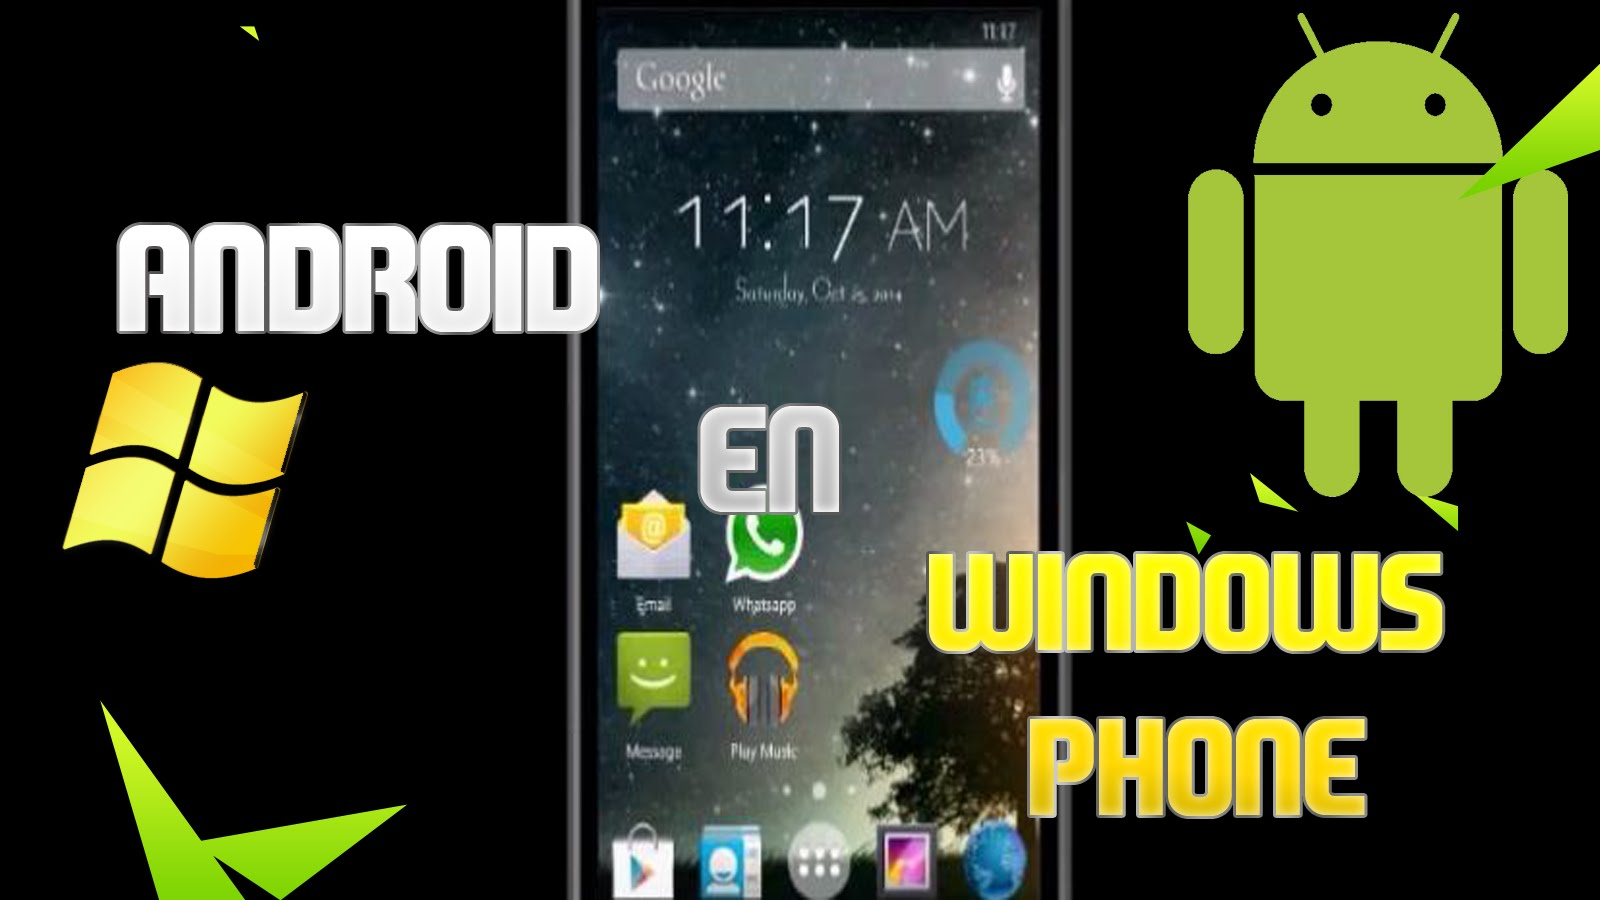 emulador-de-android-para-windows-phone-8-1